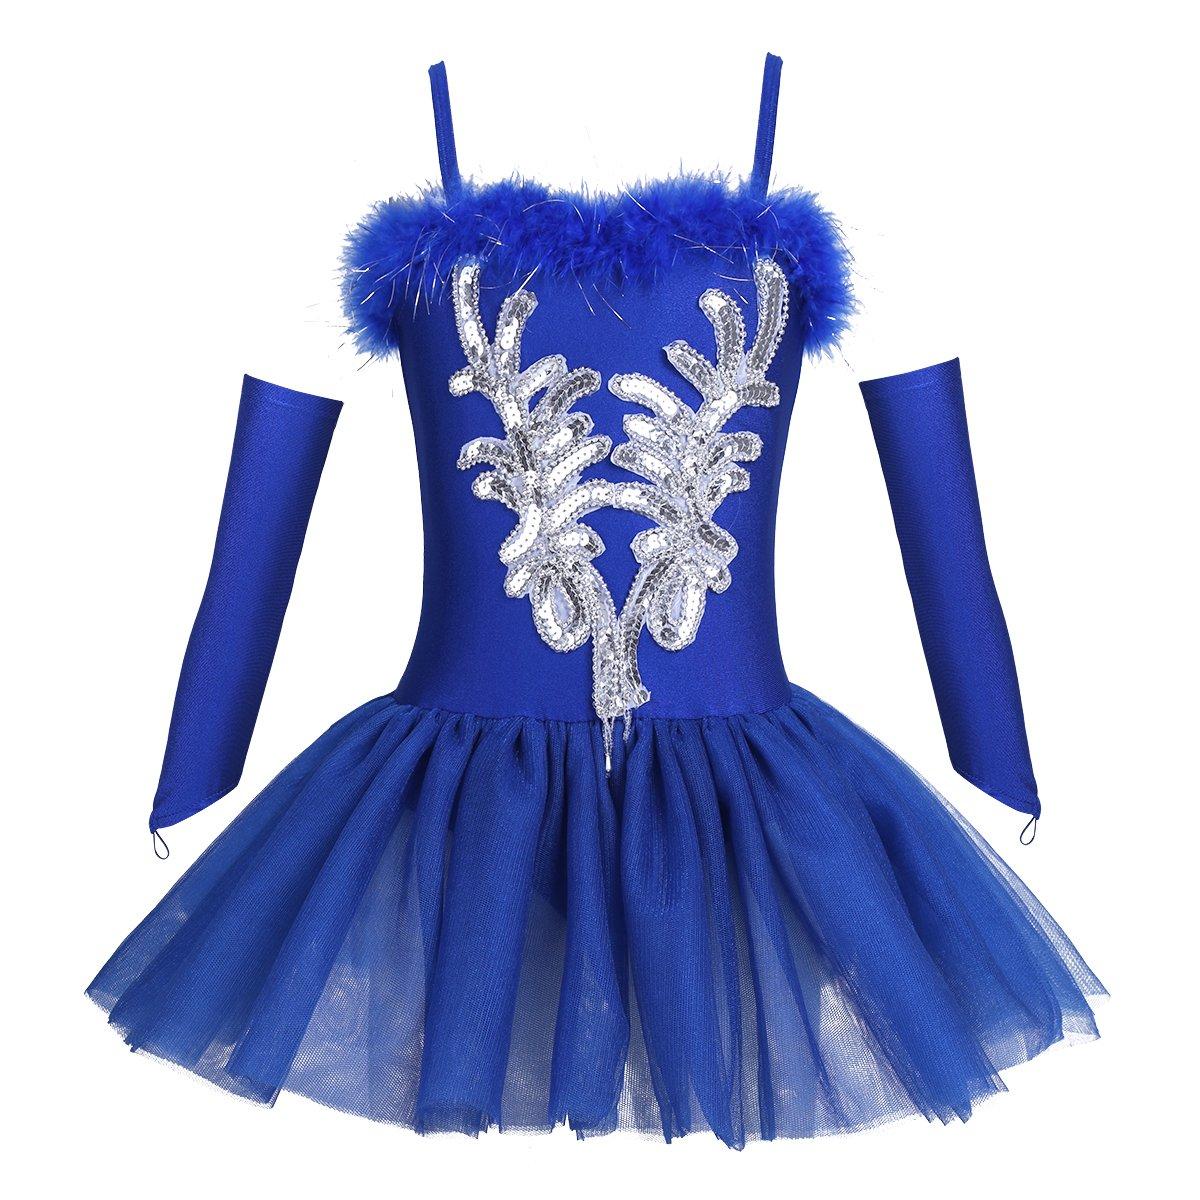 TiaoBug Girls Sequined Beads Swan Ballet Dance Leotard Spaghtetti Tutu Dress Costume with Gloves Hair Clip (4-5, Blue)